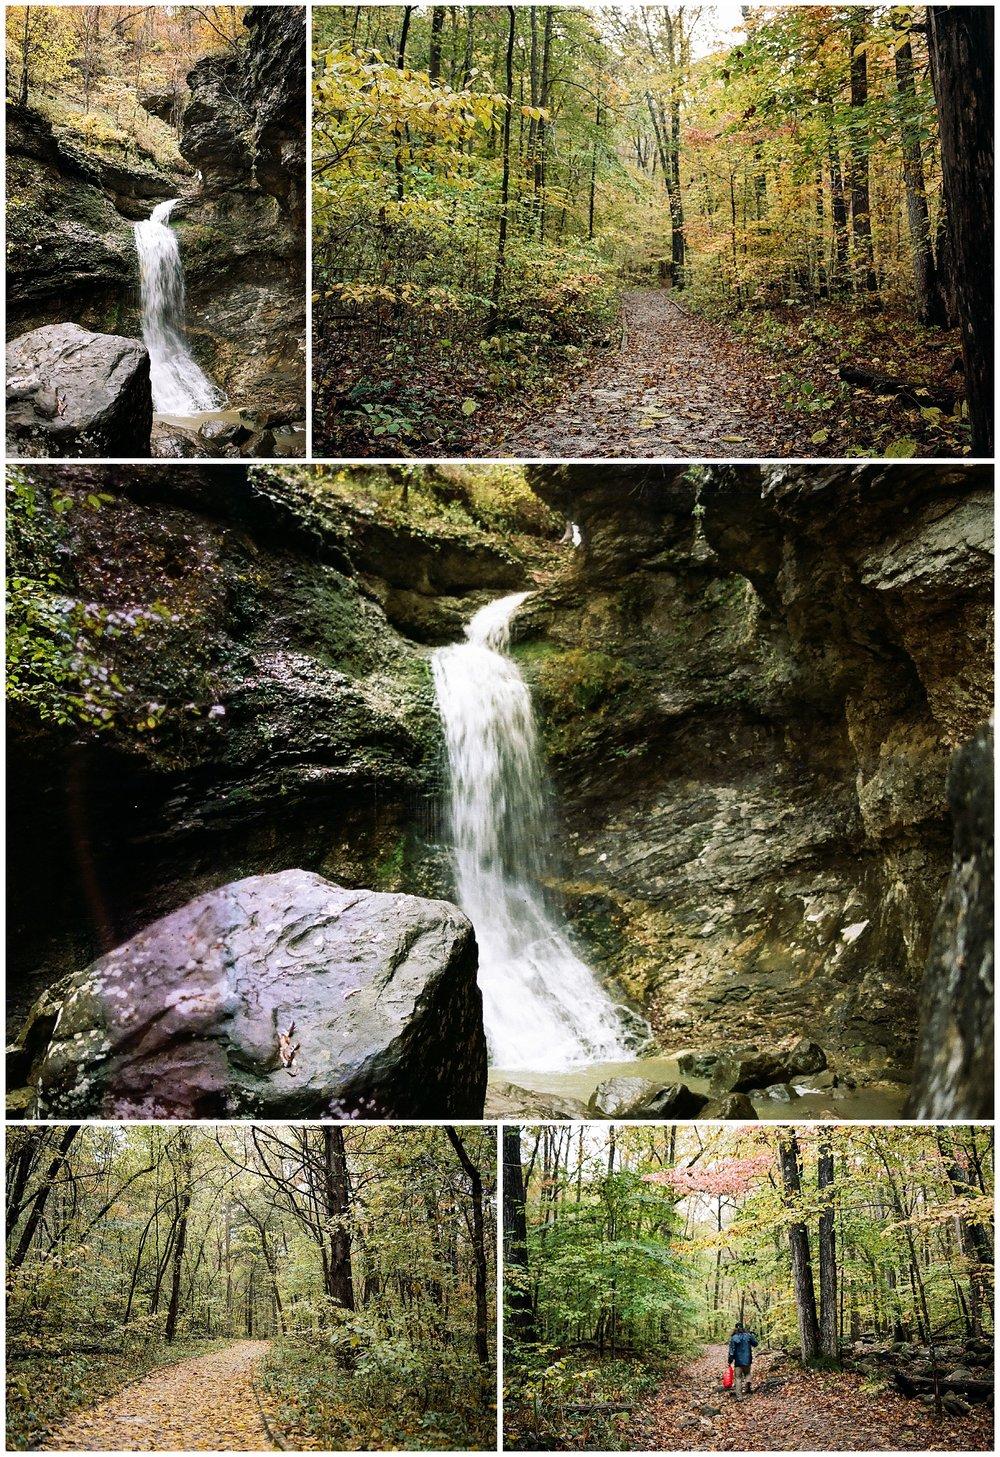 Lost Valley Eden Falls Portra 160 35mm Tanner Burge Photo